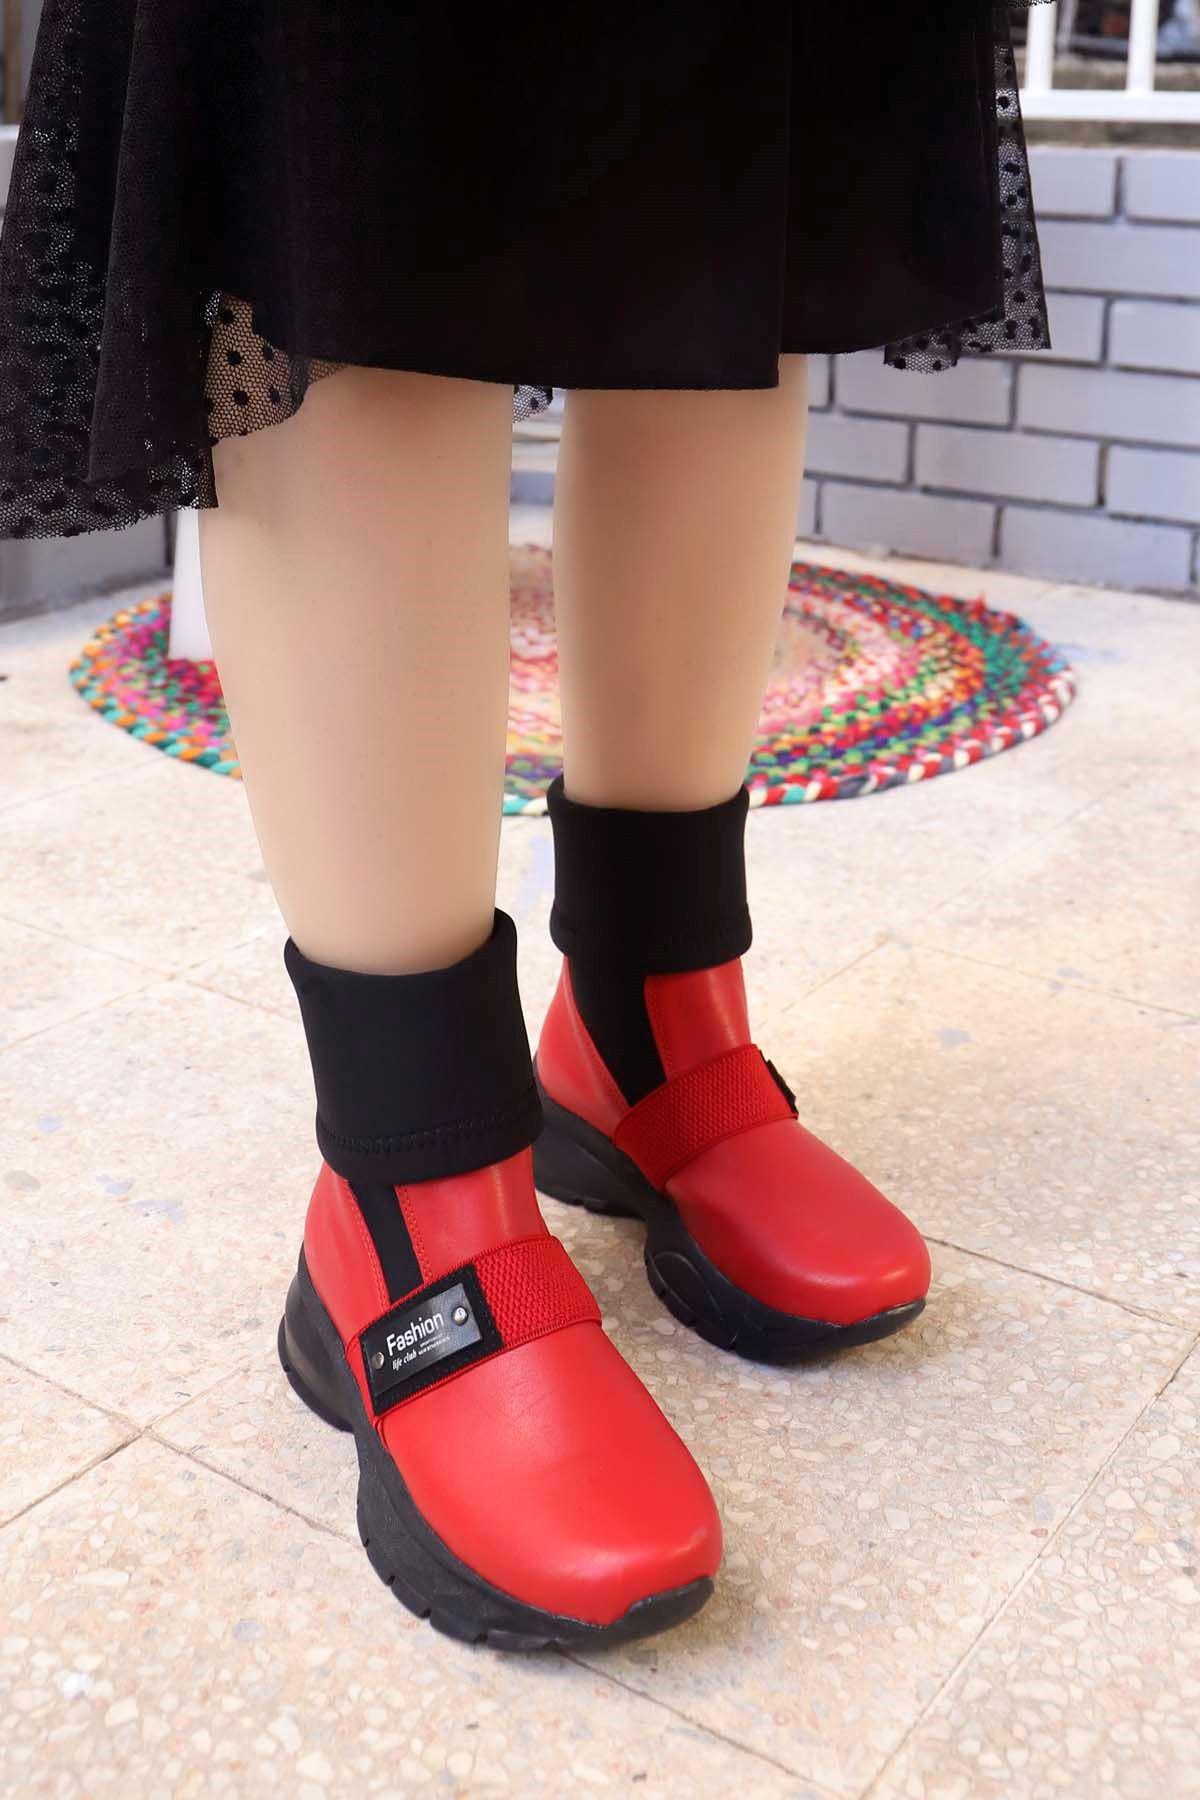 mami-303 Fashion Strec Corap Bot Kırmızı